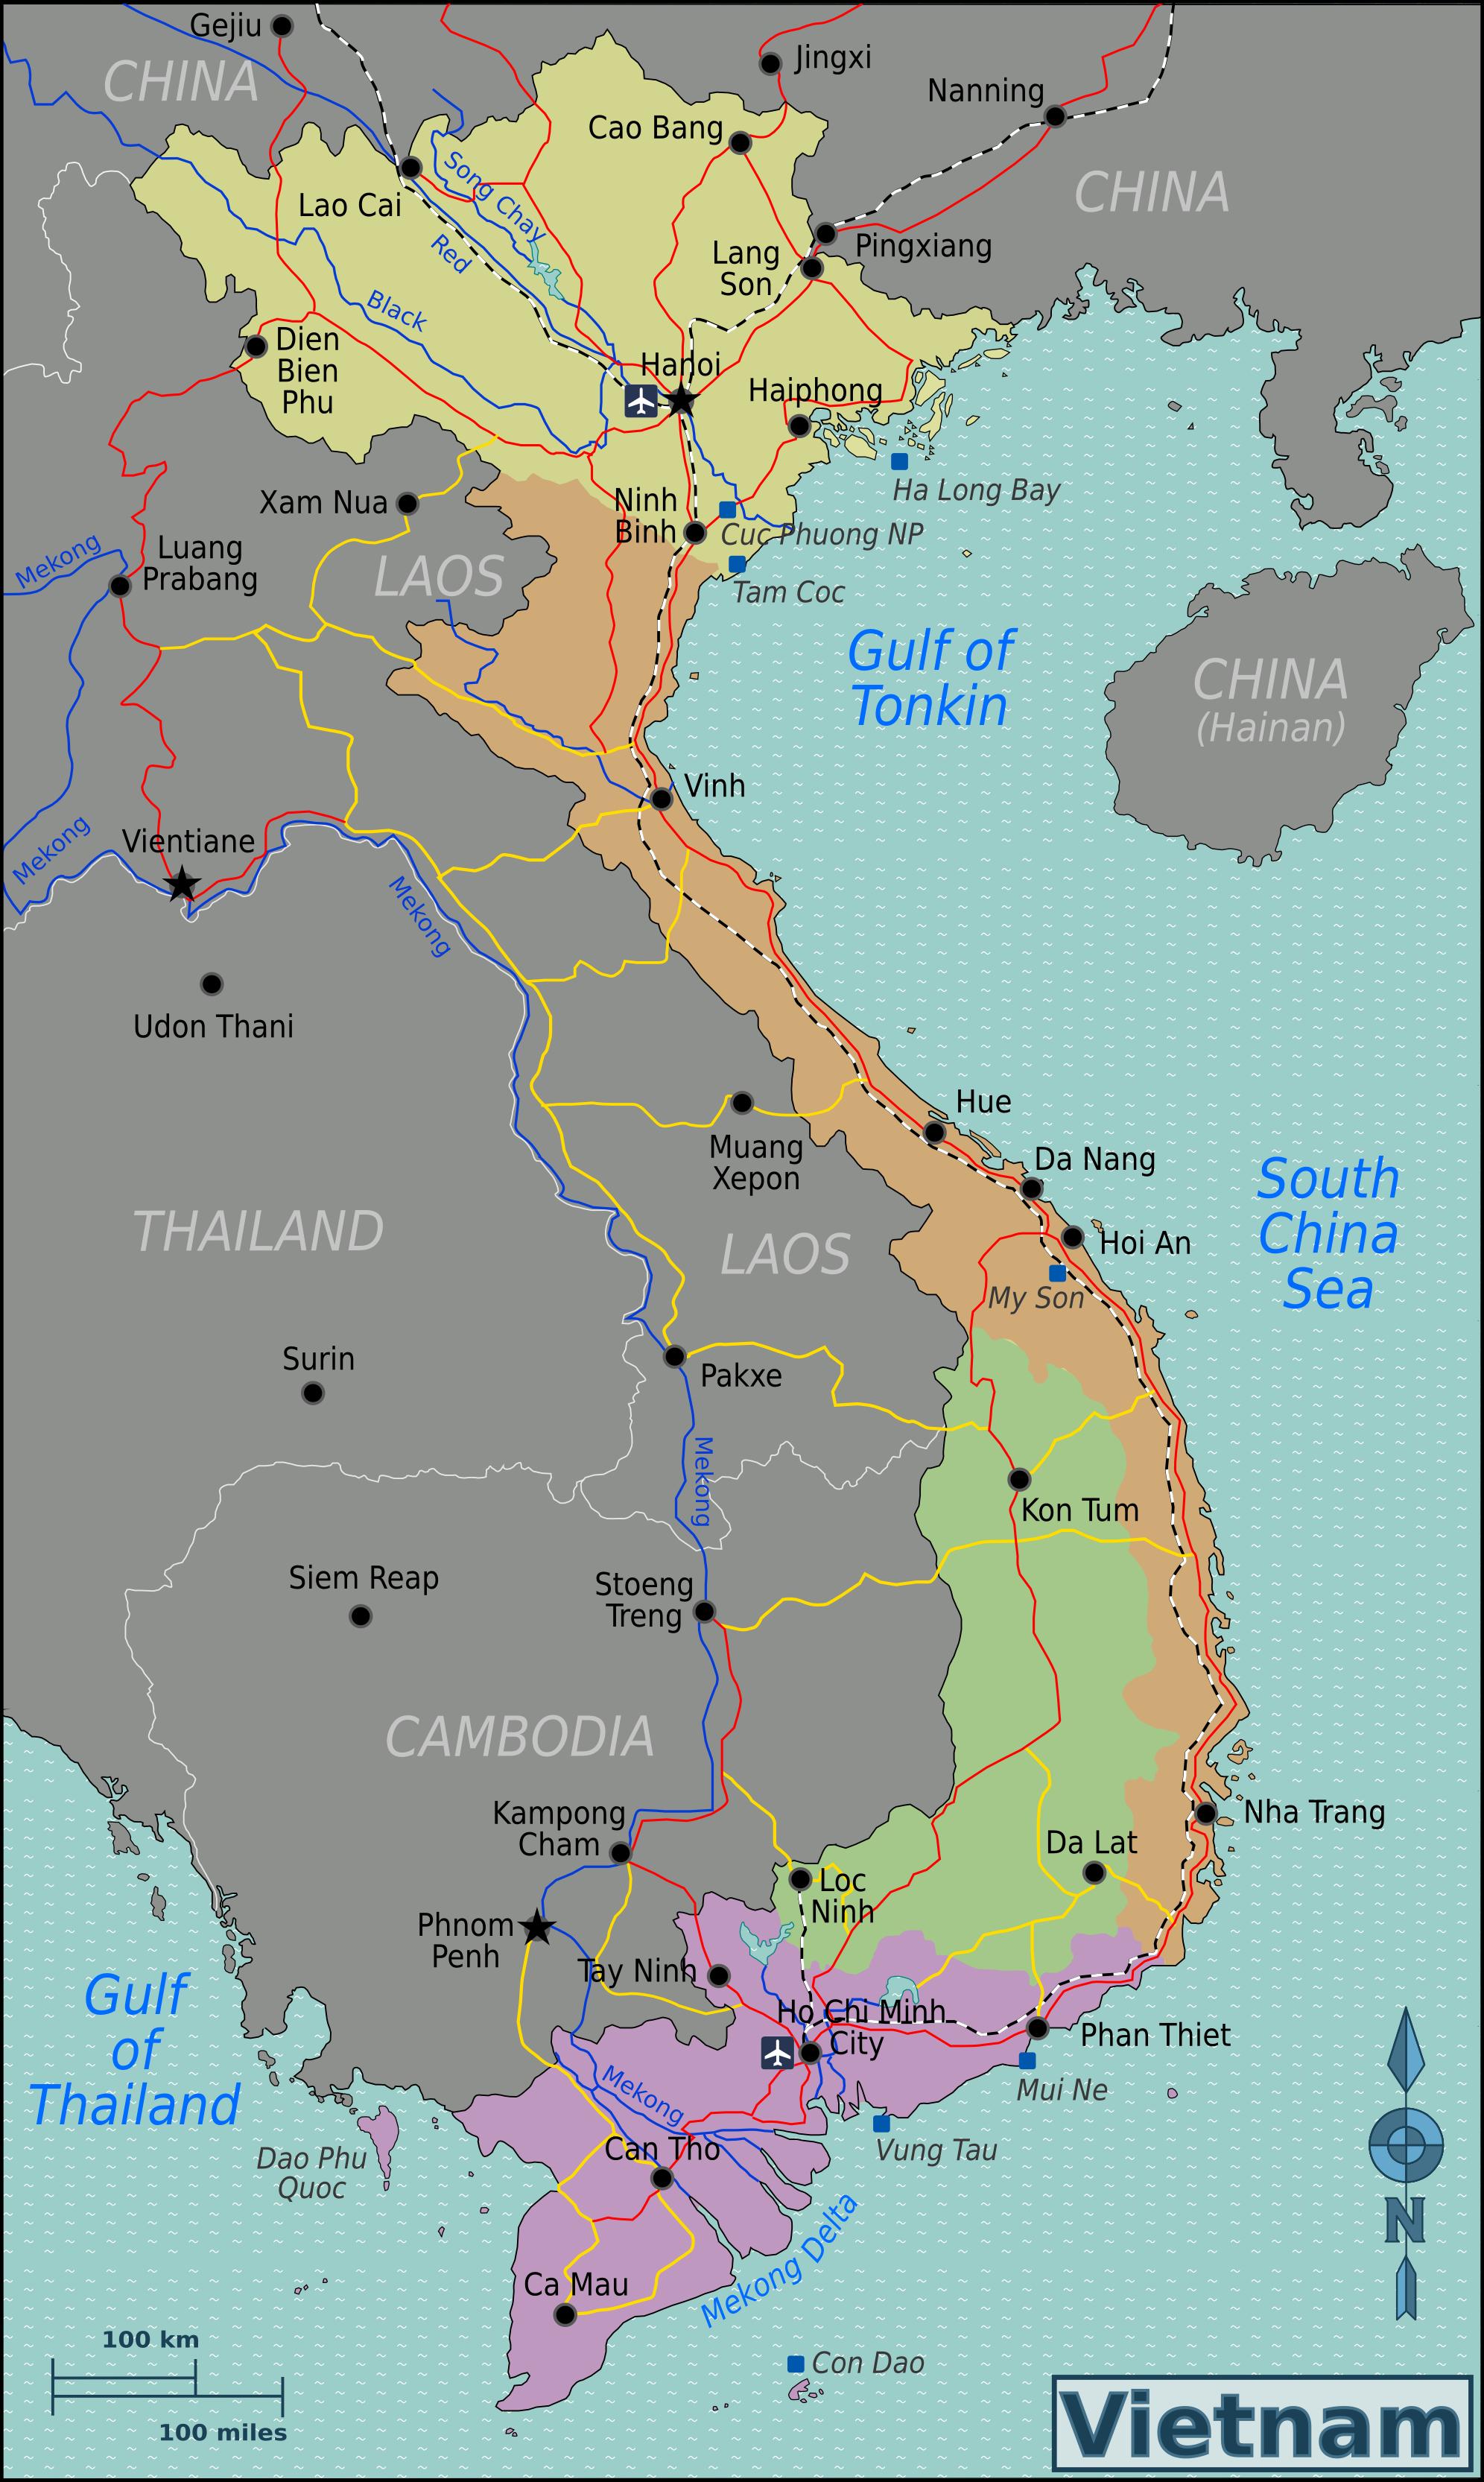 landkarte vietnam Vietnam Regionen Karte landkarte vietnam